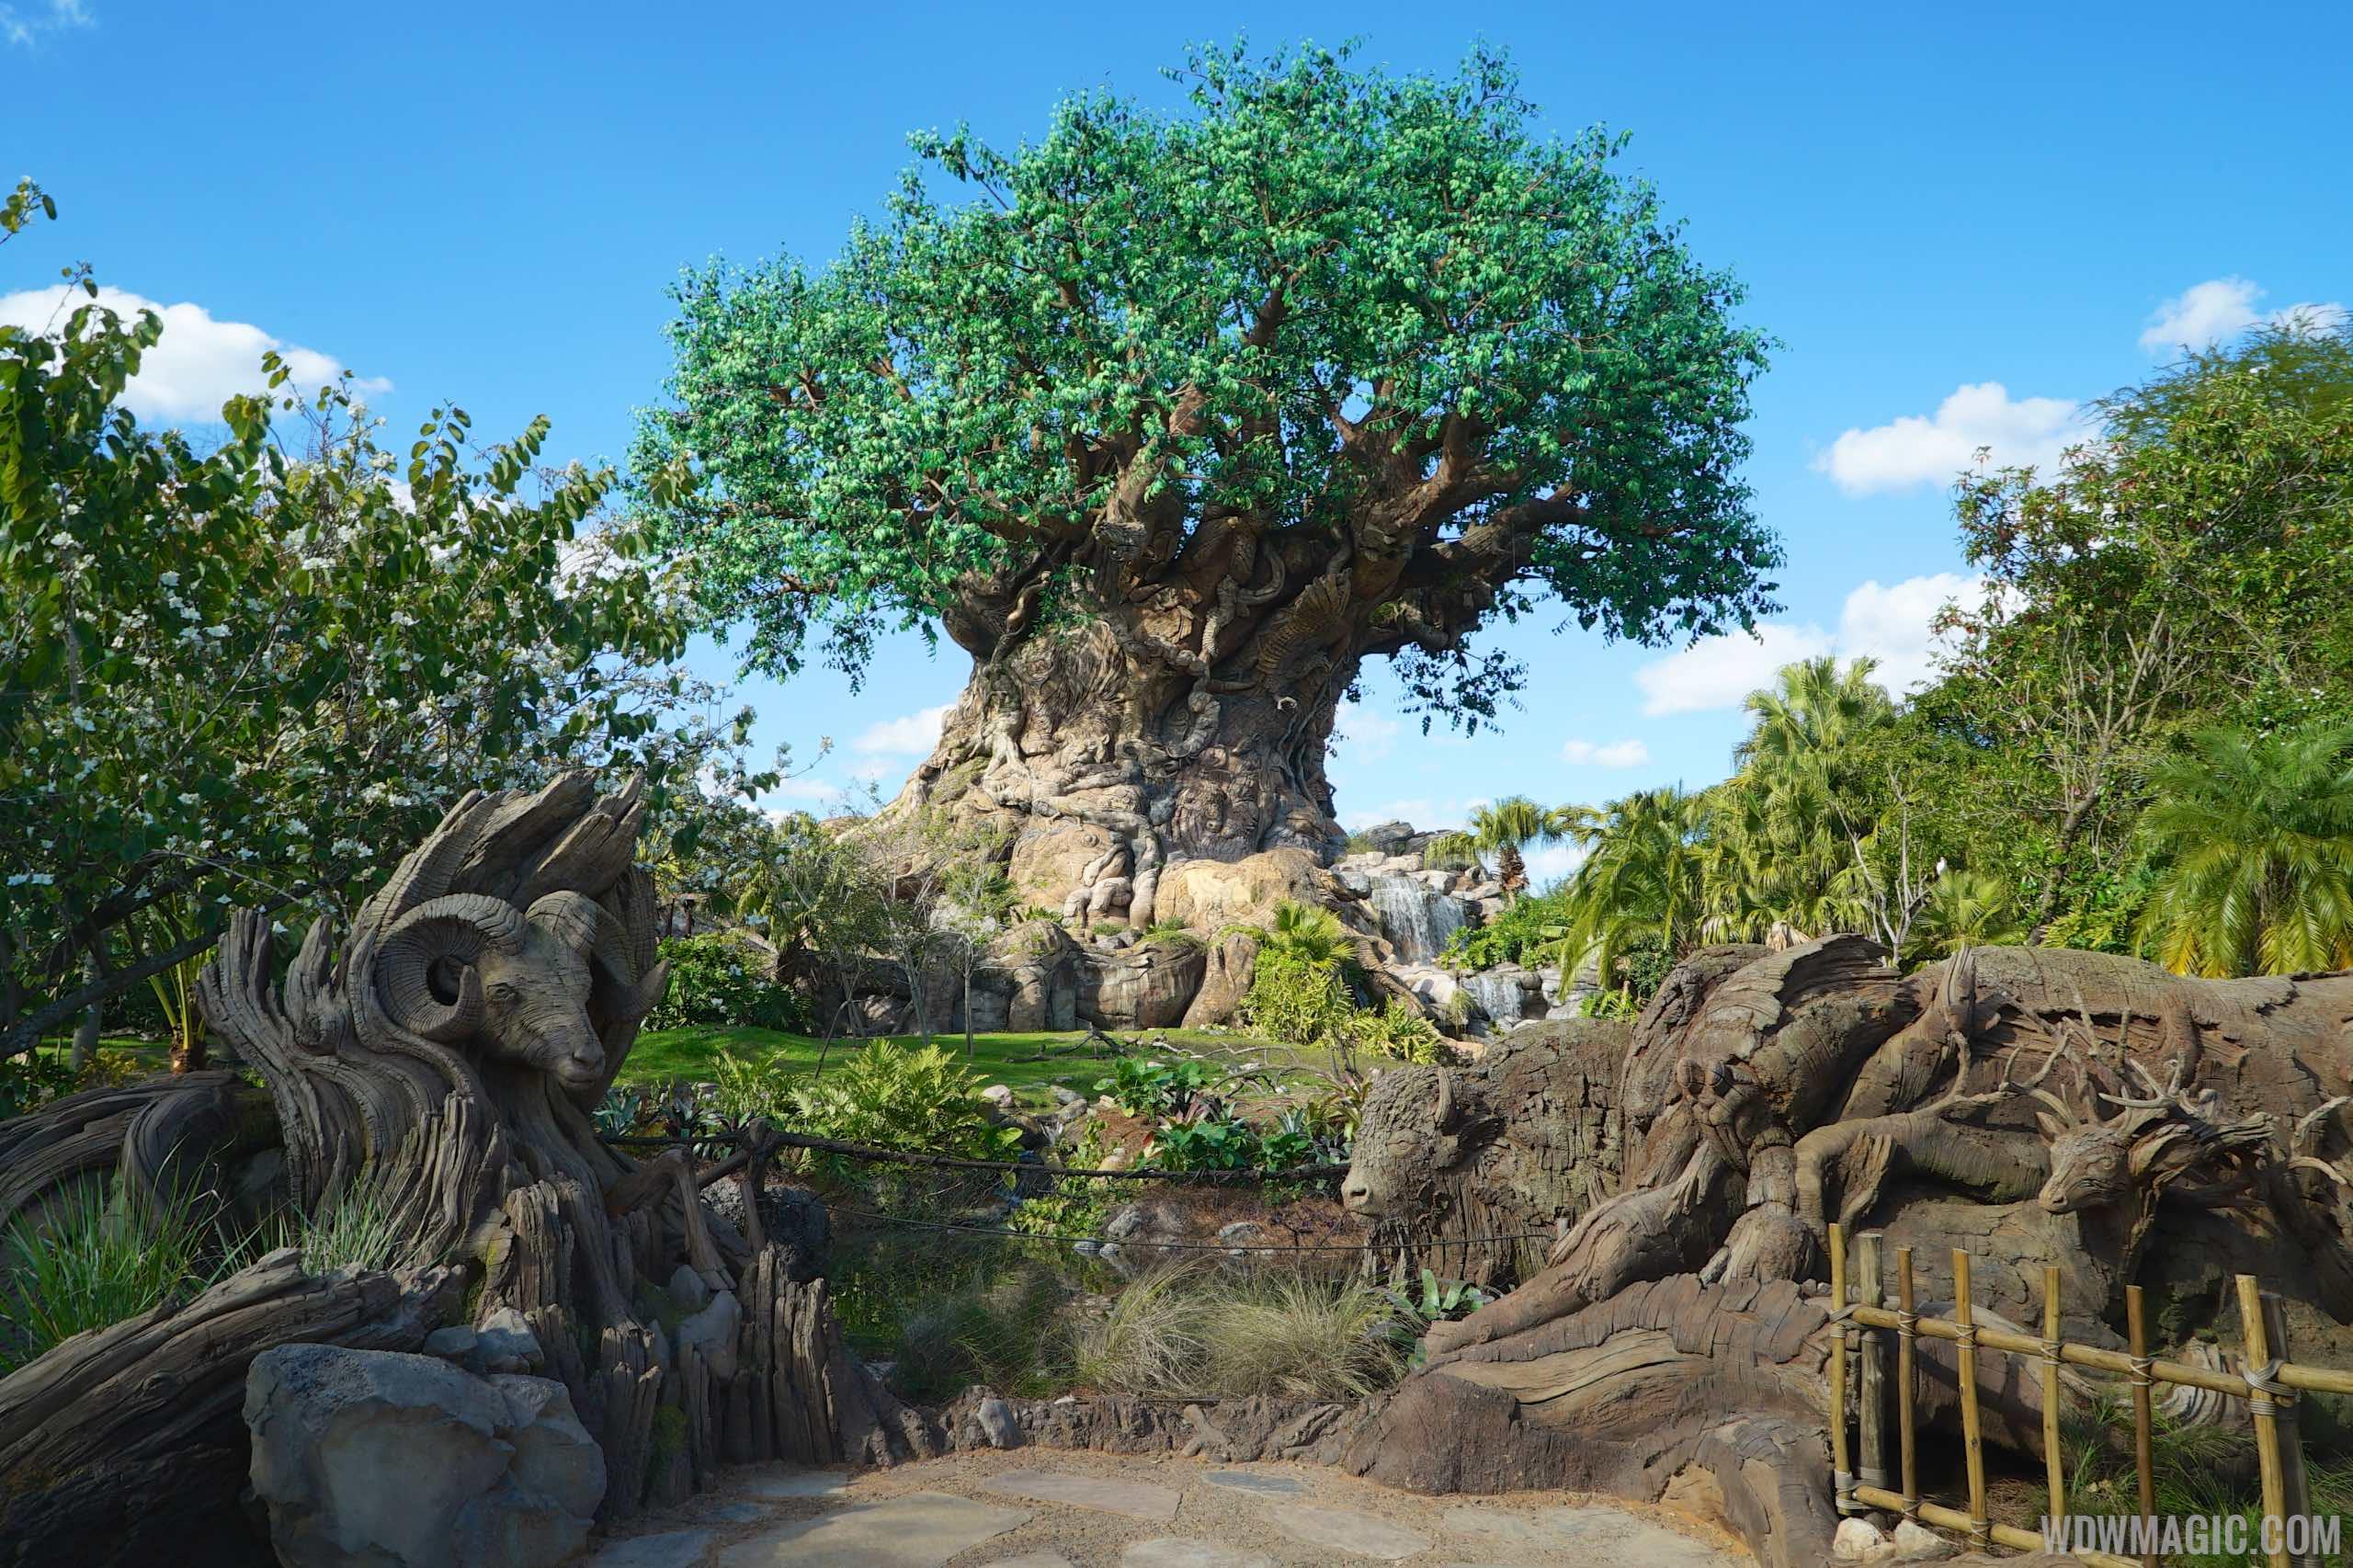 Tree of Life - the centerpiece of Disney's Animal Kingdom